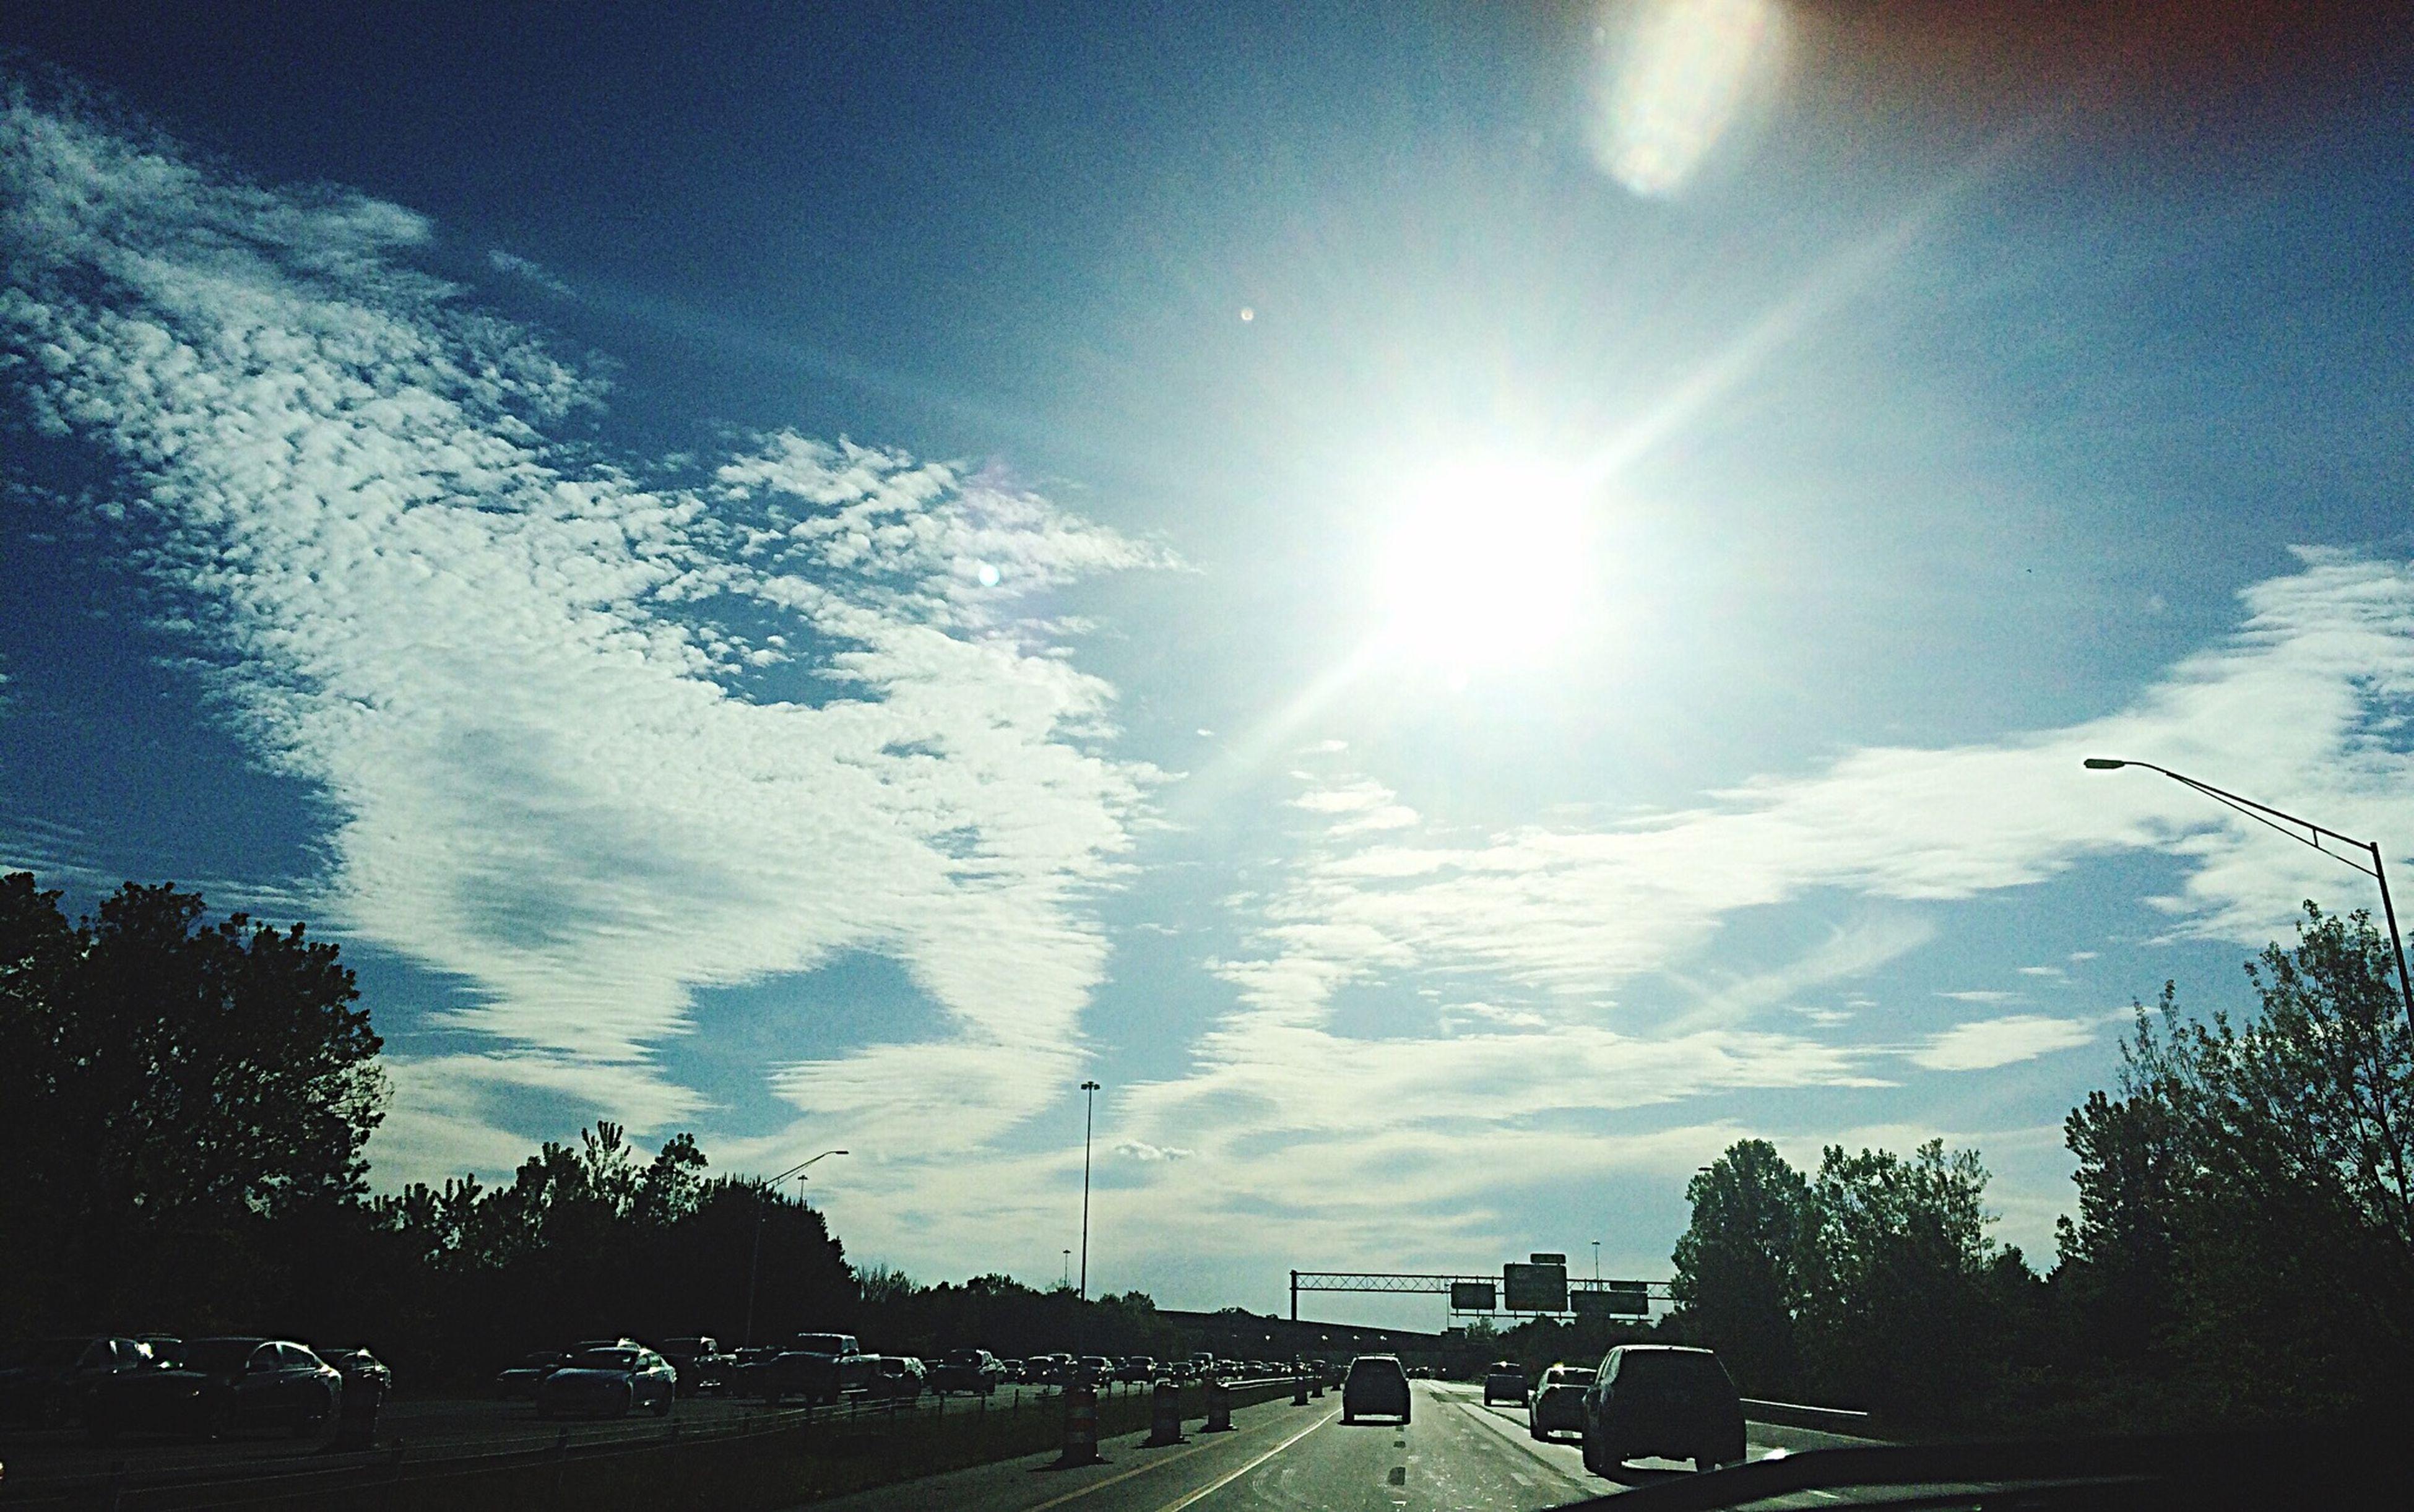 sun, sunbeam, sunlight, sky, transportation, road, lens flare, tree, the way forward, car, cloud - sky, sunny, street, nature, silhouette, built structure, diminishing perspective, vanishing point, blue, bright